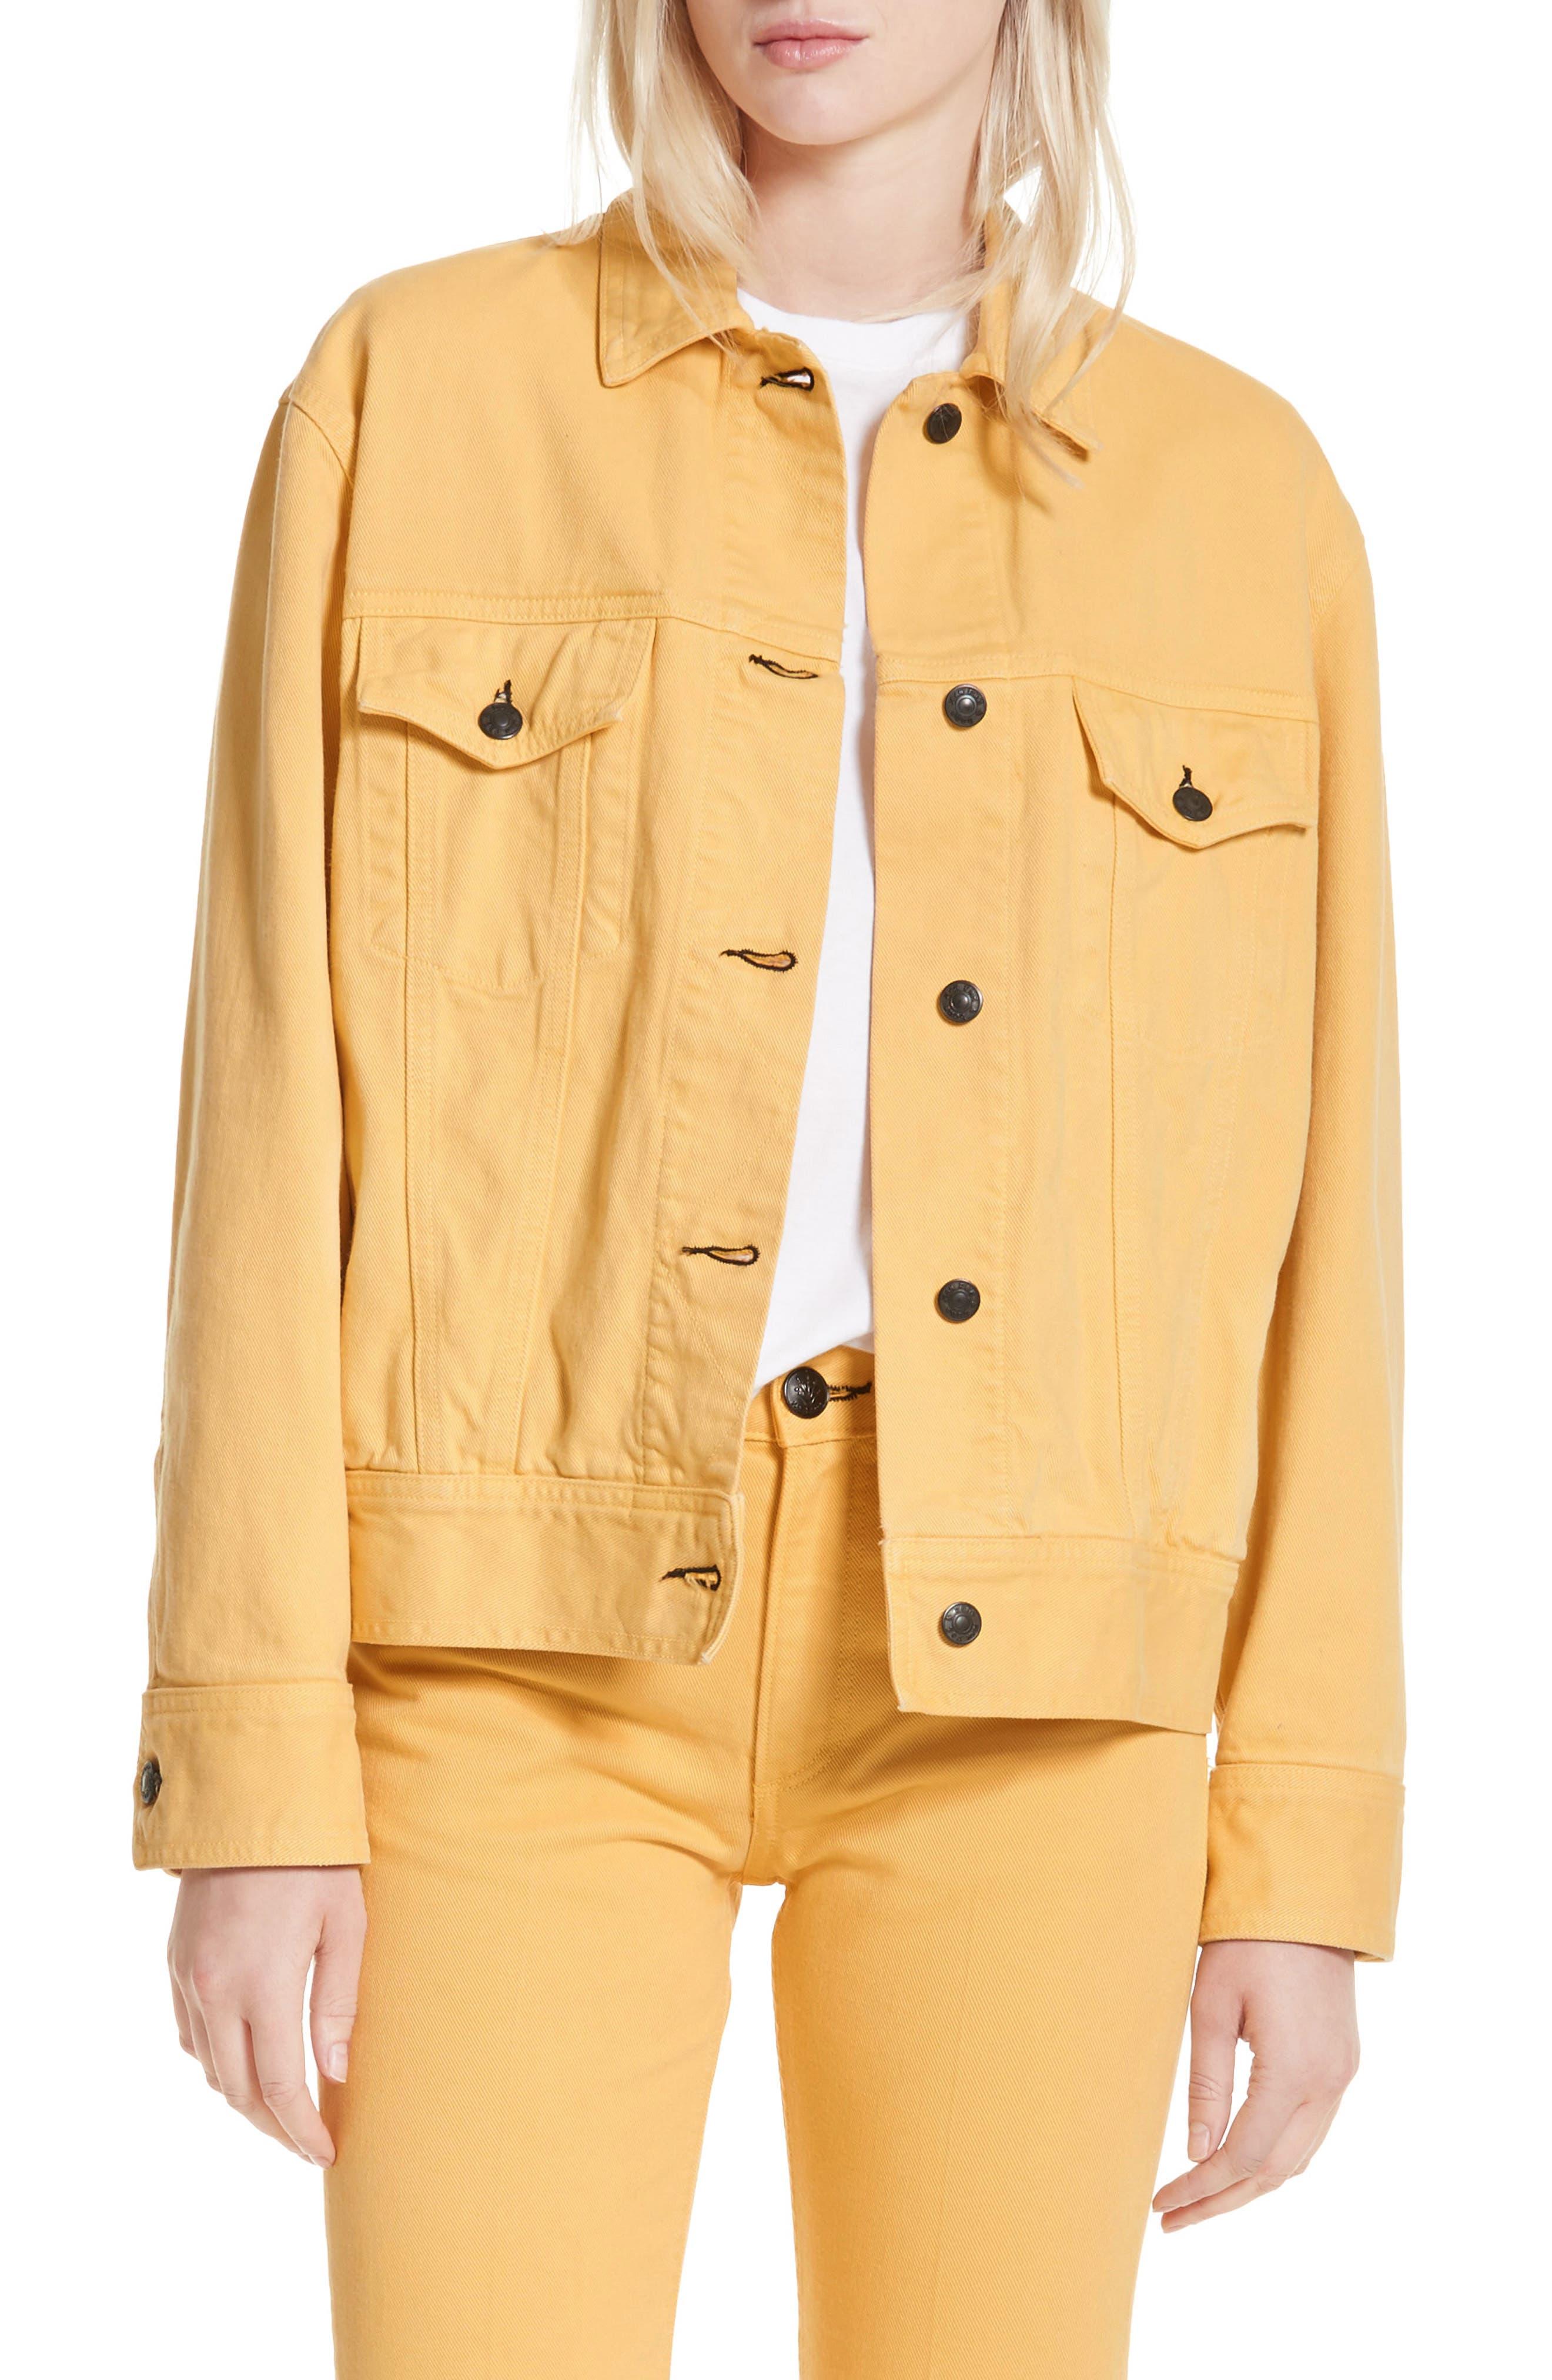 rag & bone Oversize Twill Jacket,                             Main thumbnail 1, color,                             730